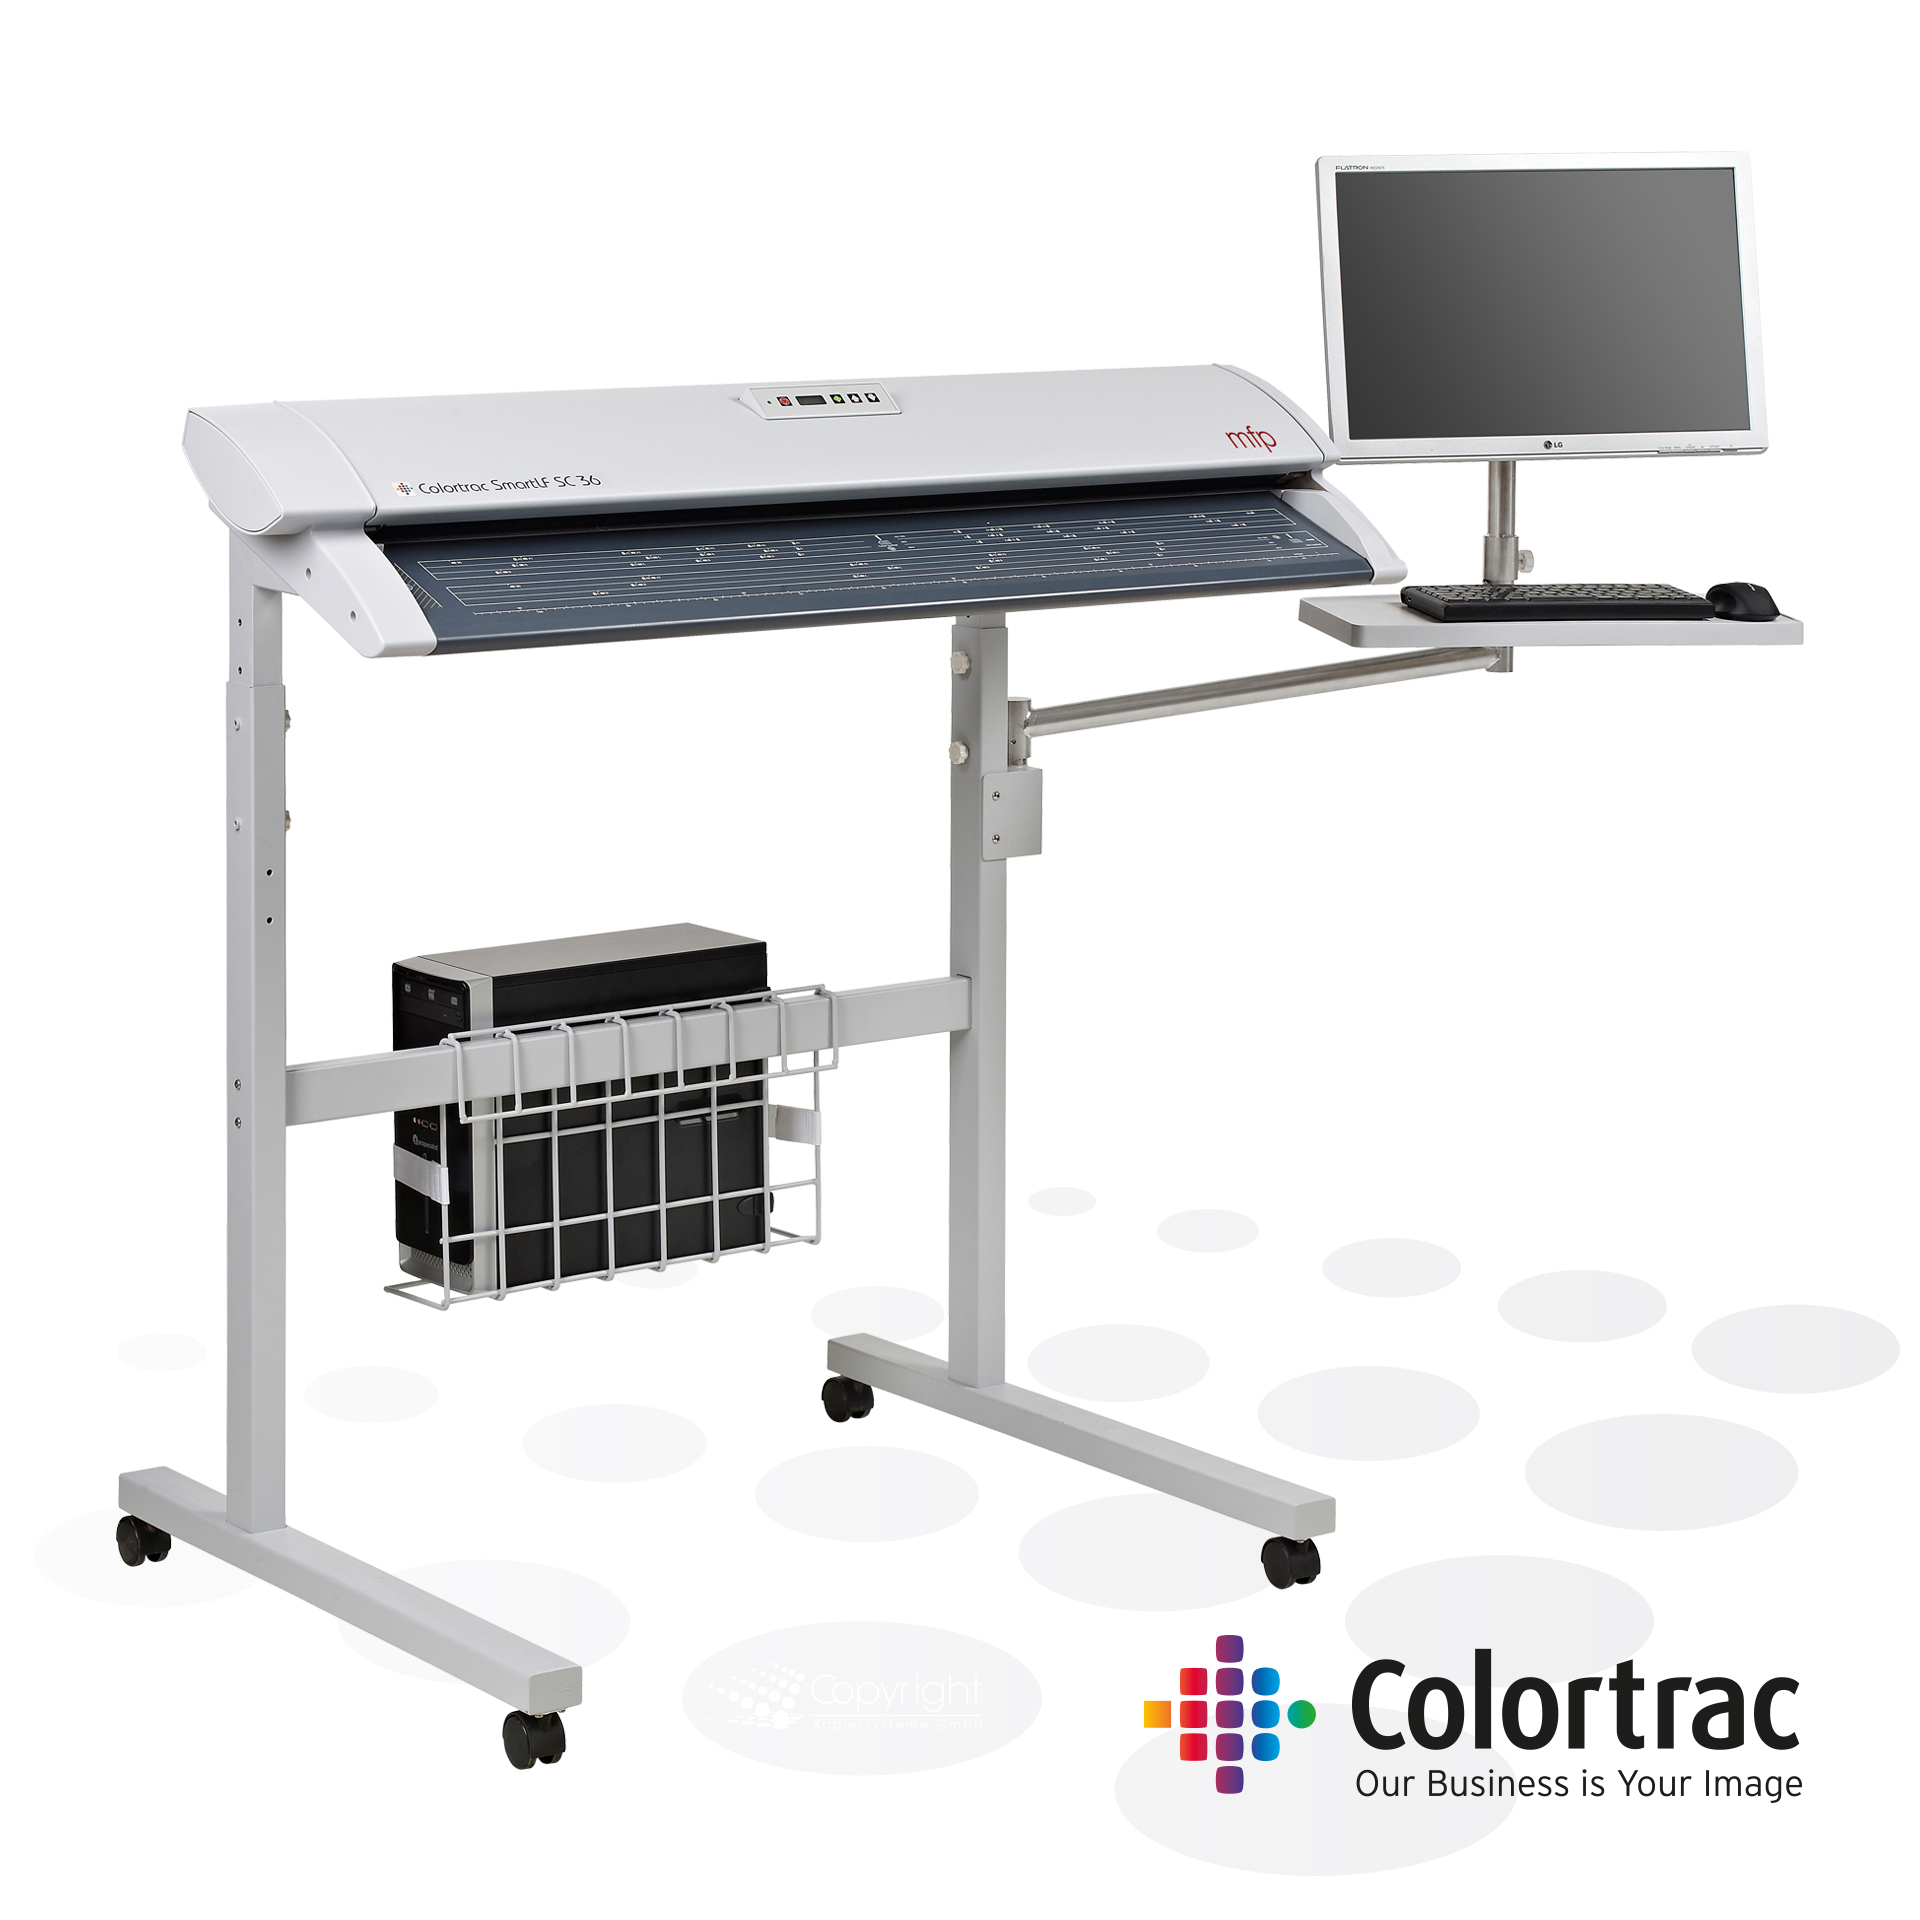 Colortrac SmartLF Scanner SC Xpress36 MFP